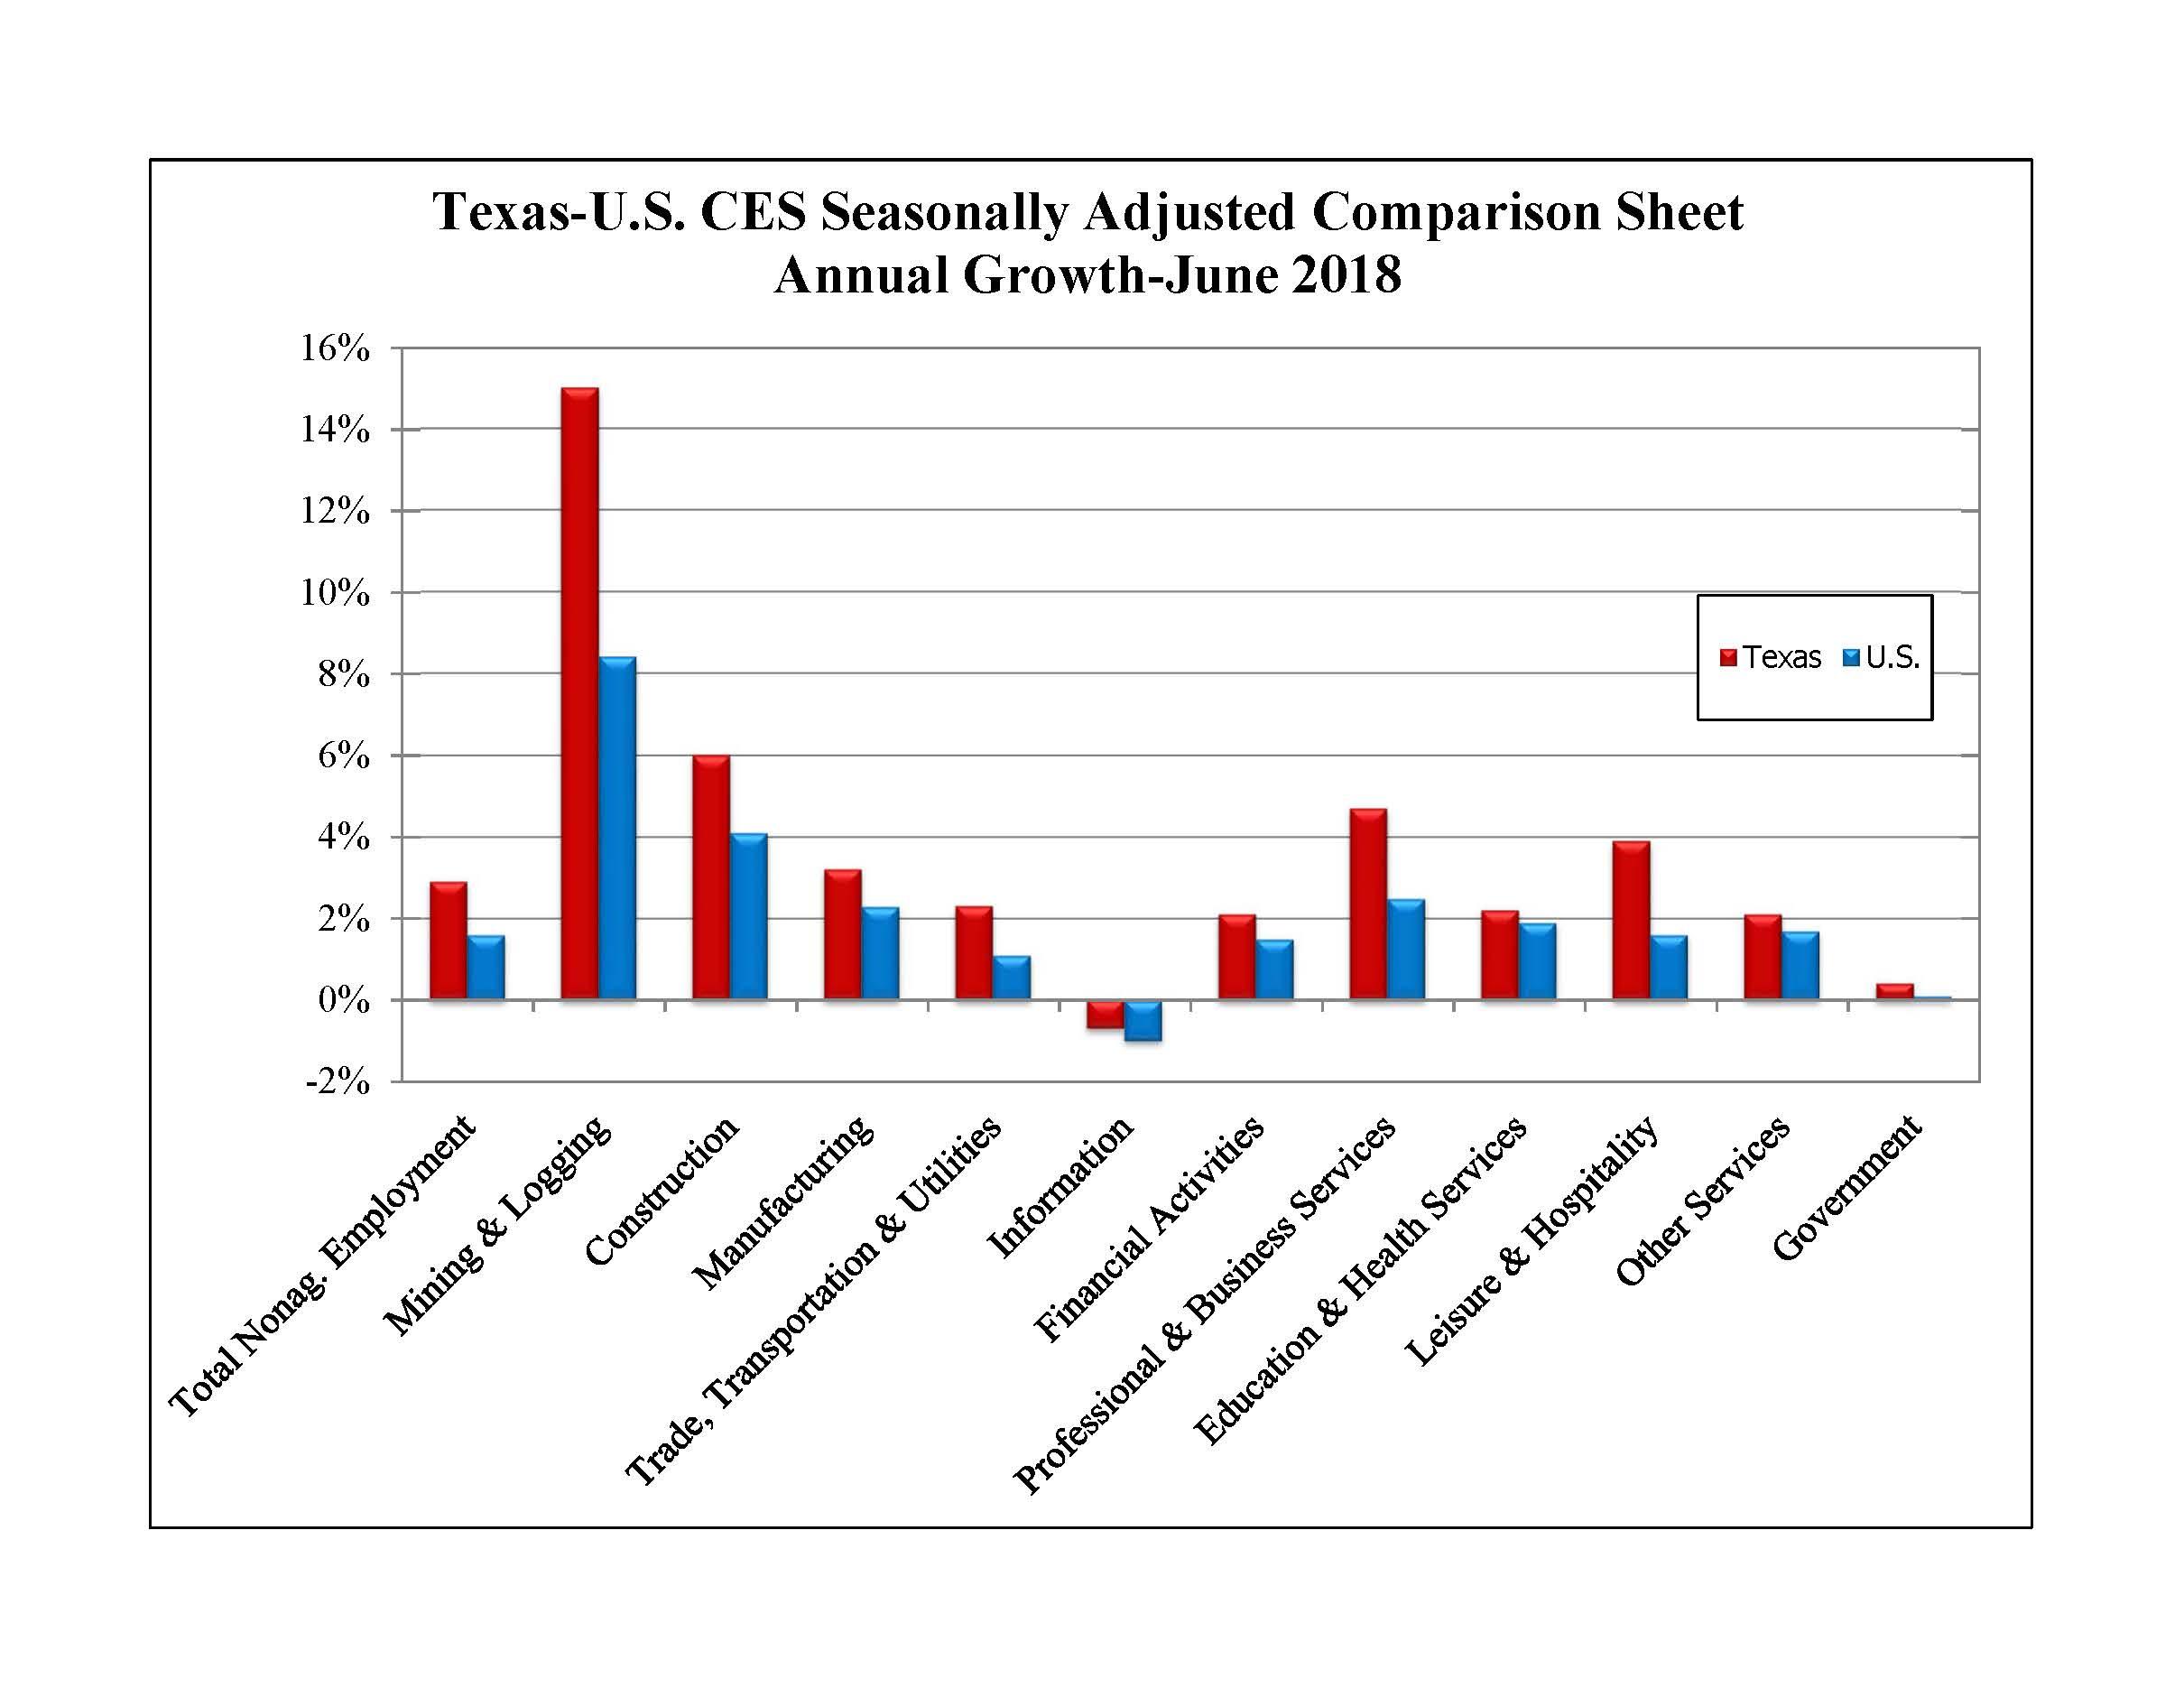 Texas-U.S. CES Seasonally Adjusted Comparison Sheet Annual Growth - June 2018